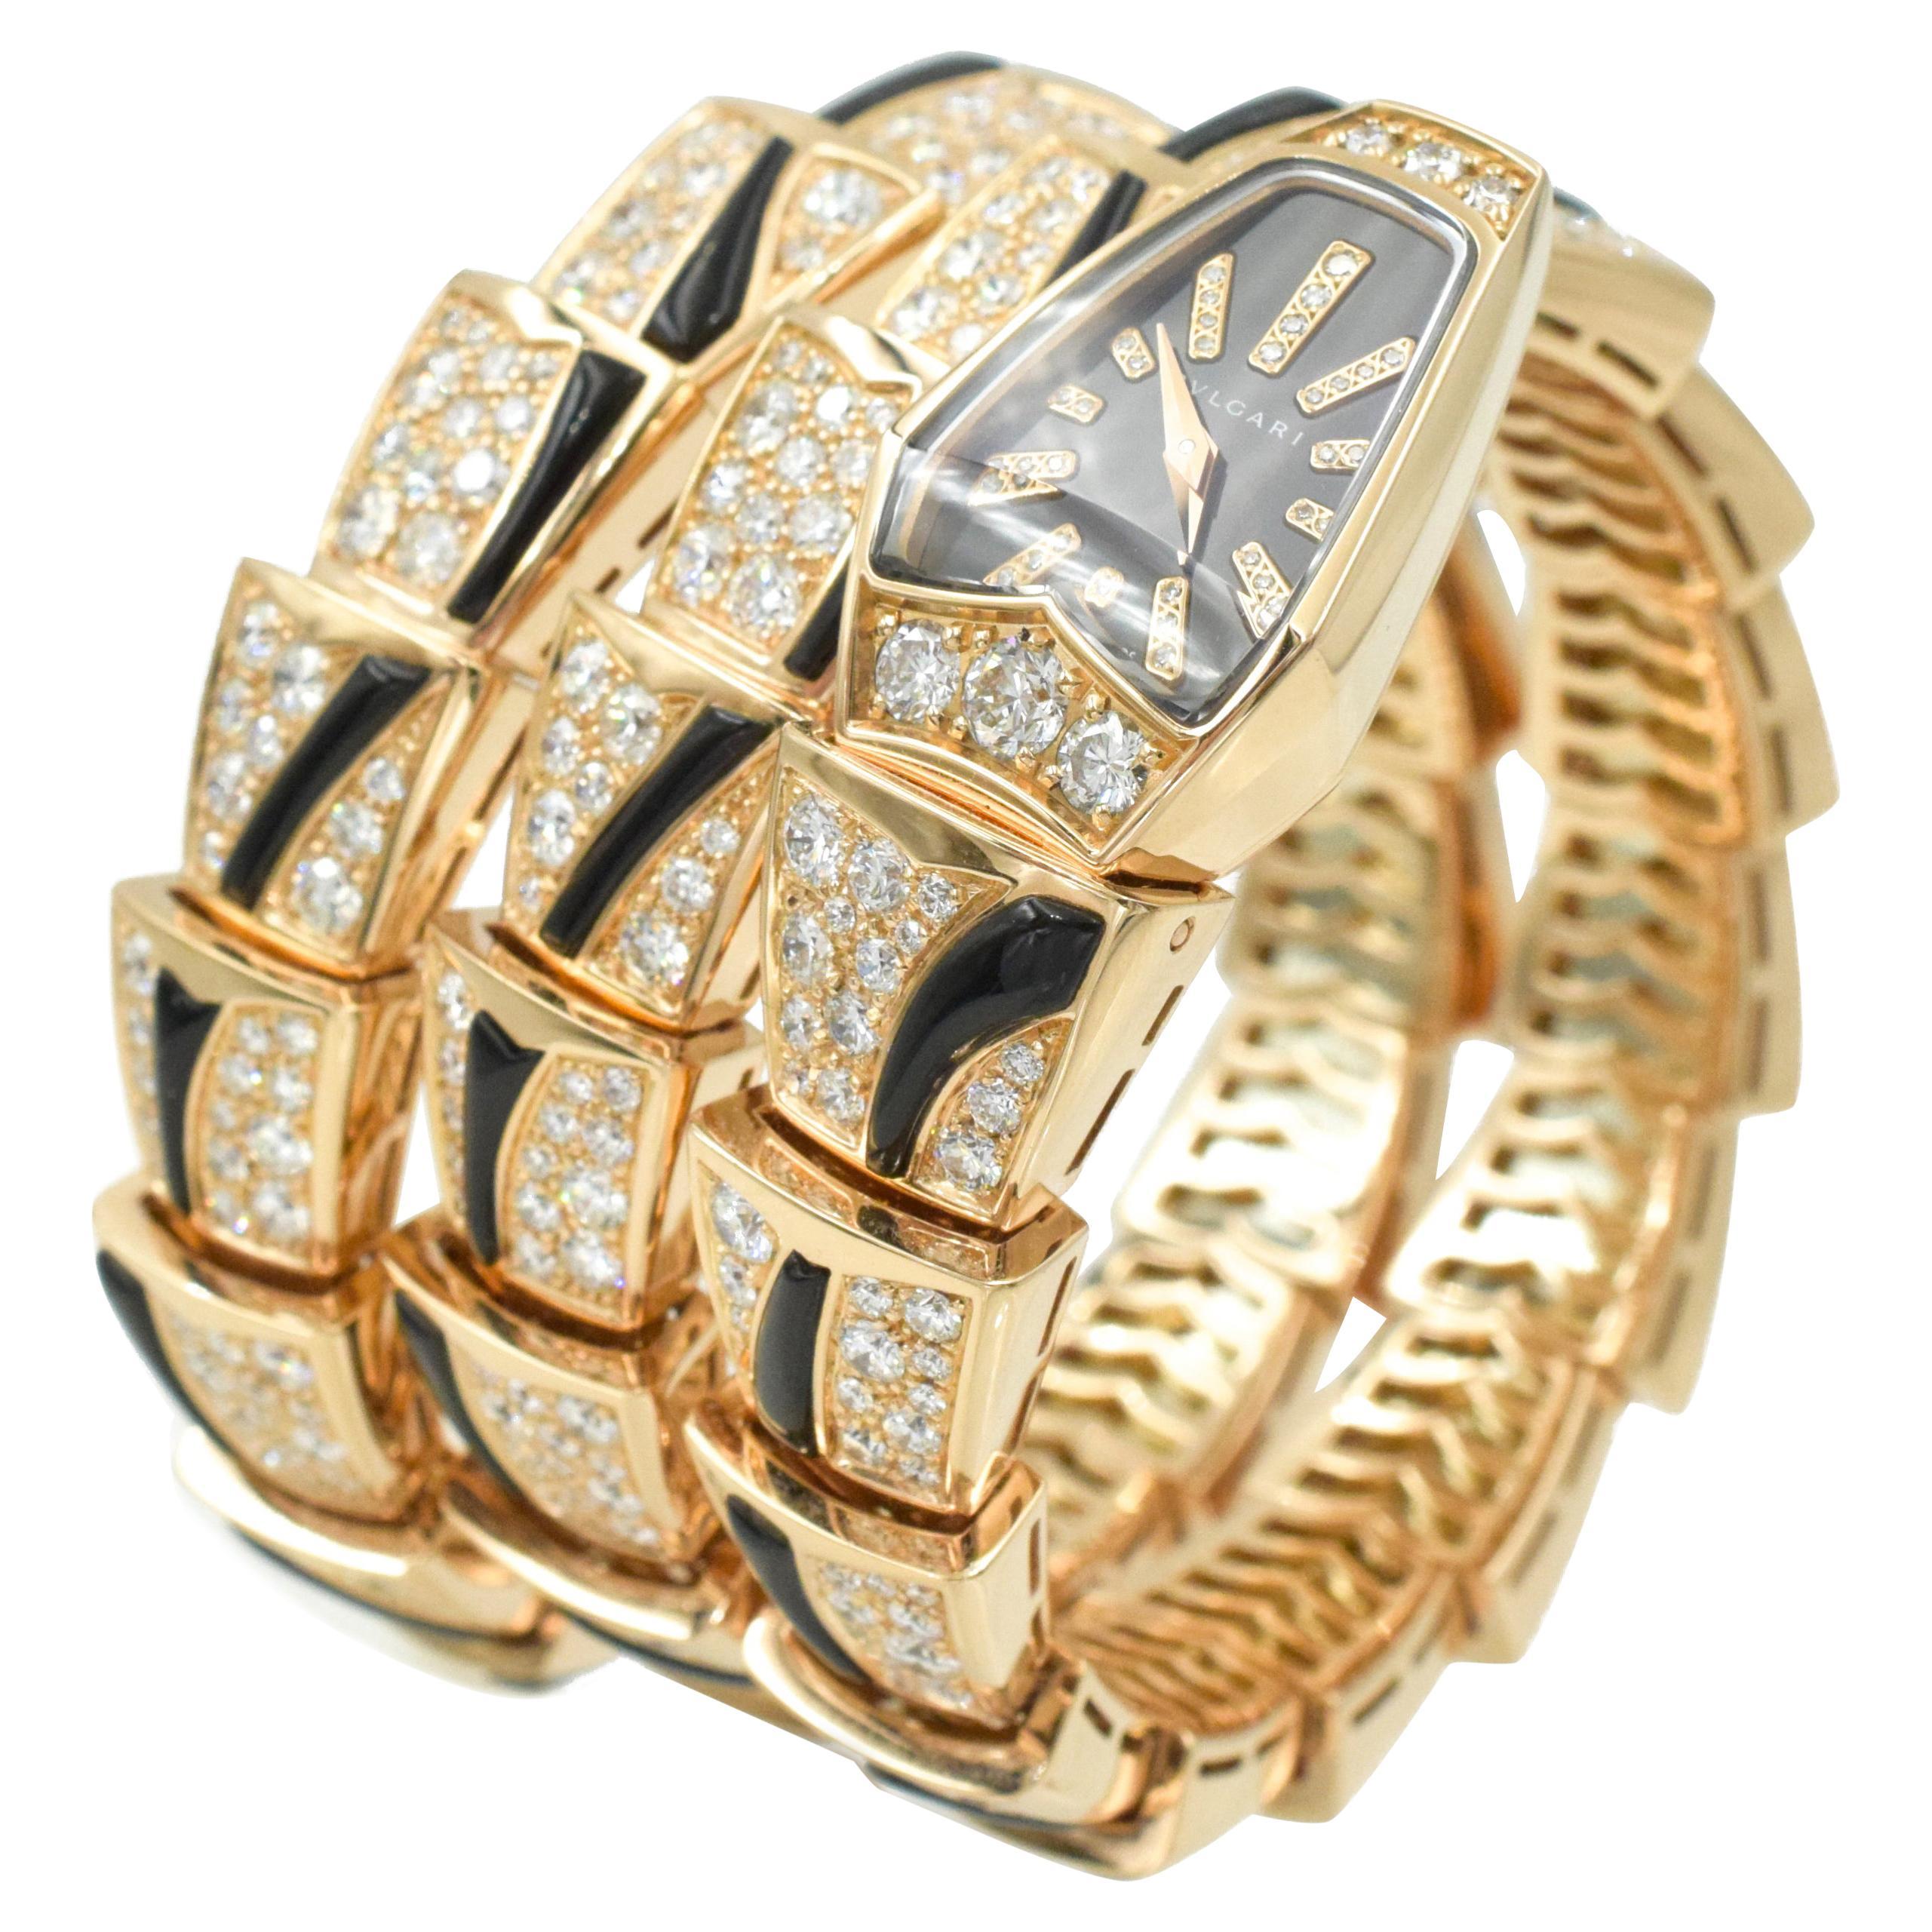 Bulgari Diamond and Onyx 'Serpenti' Wristwatch in 18k Rose Gold